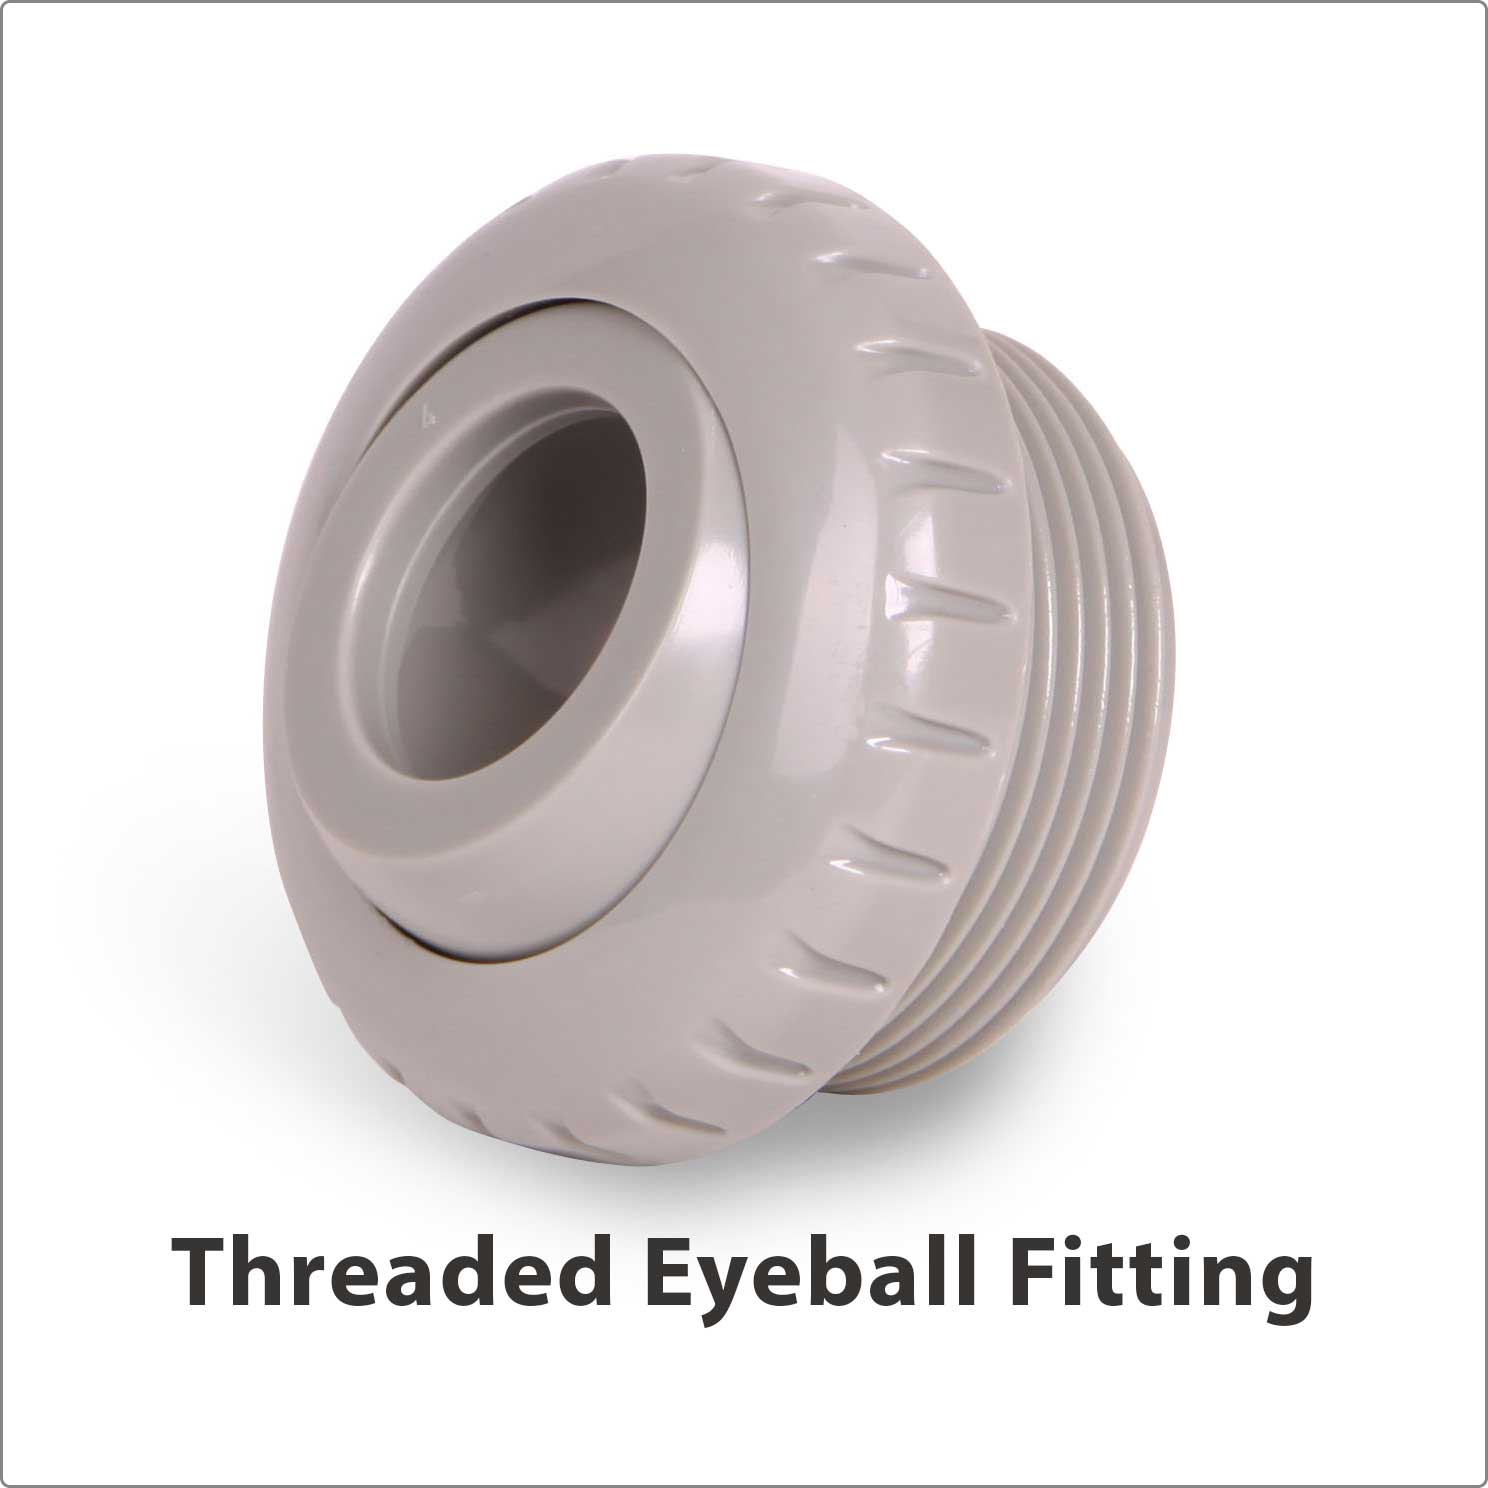 Threaded Eyeball Fitting